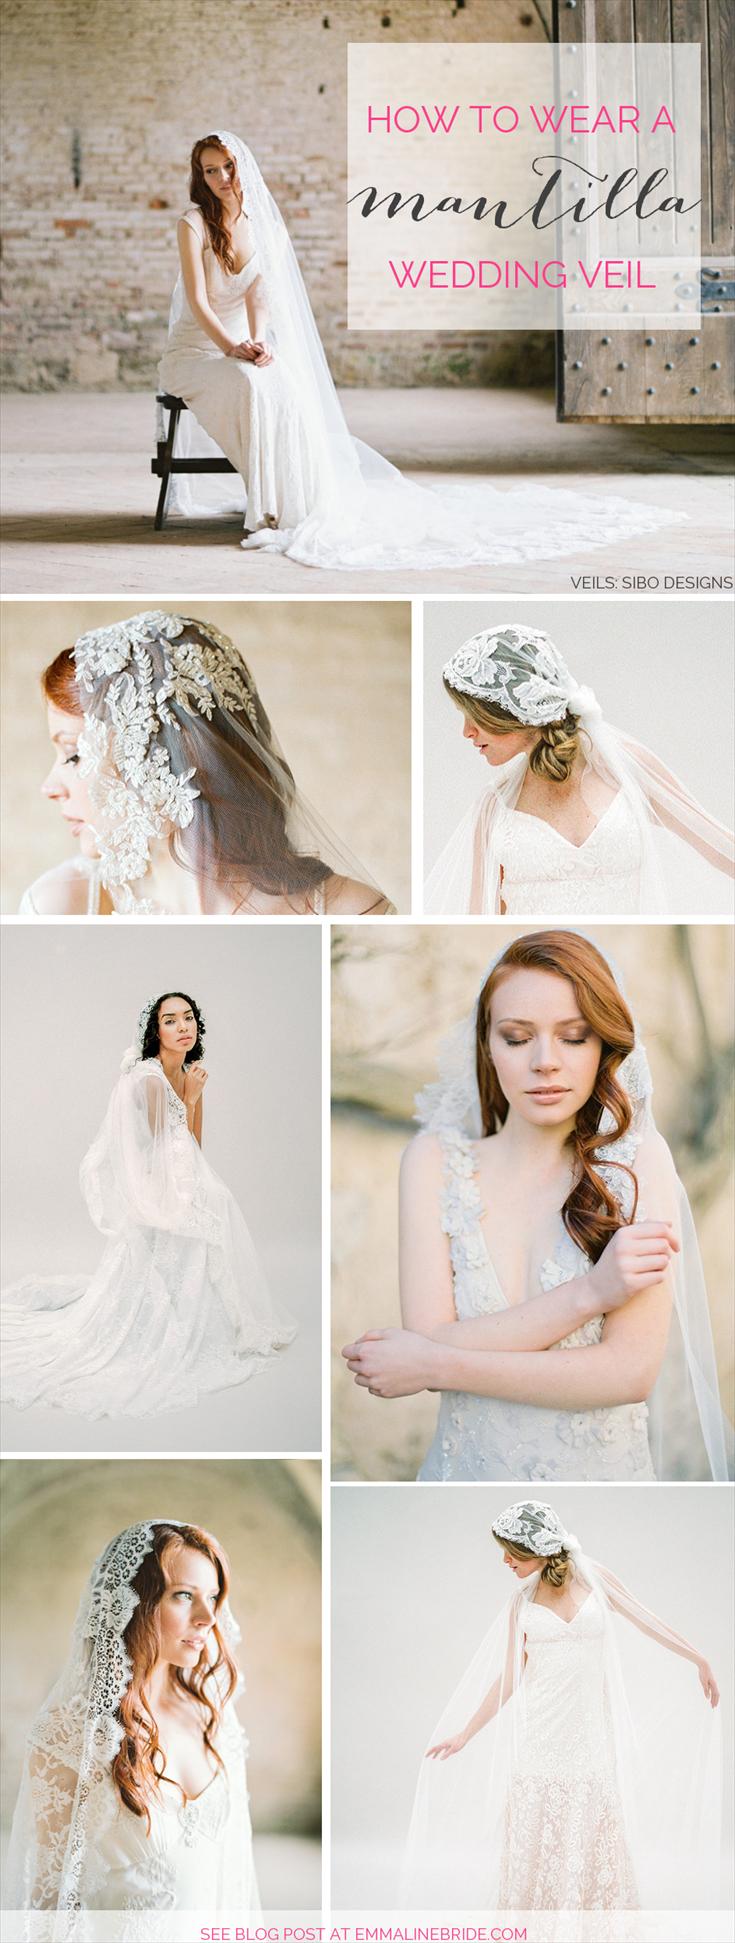 How to wear a mantilla wedding veil